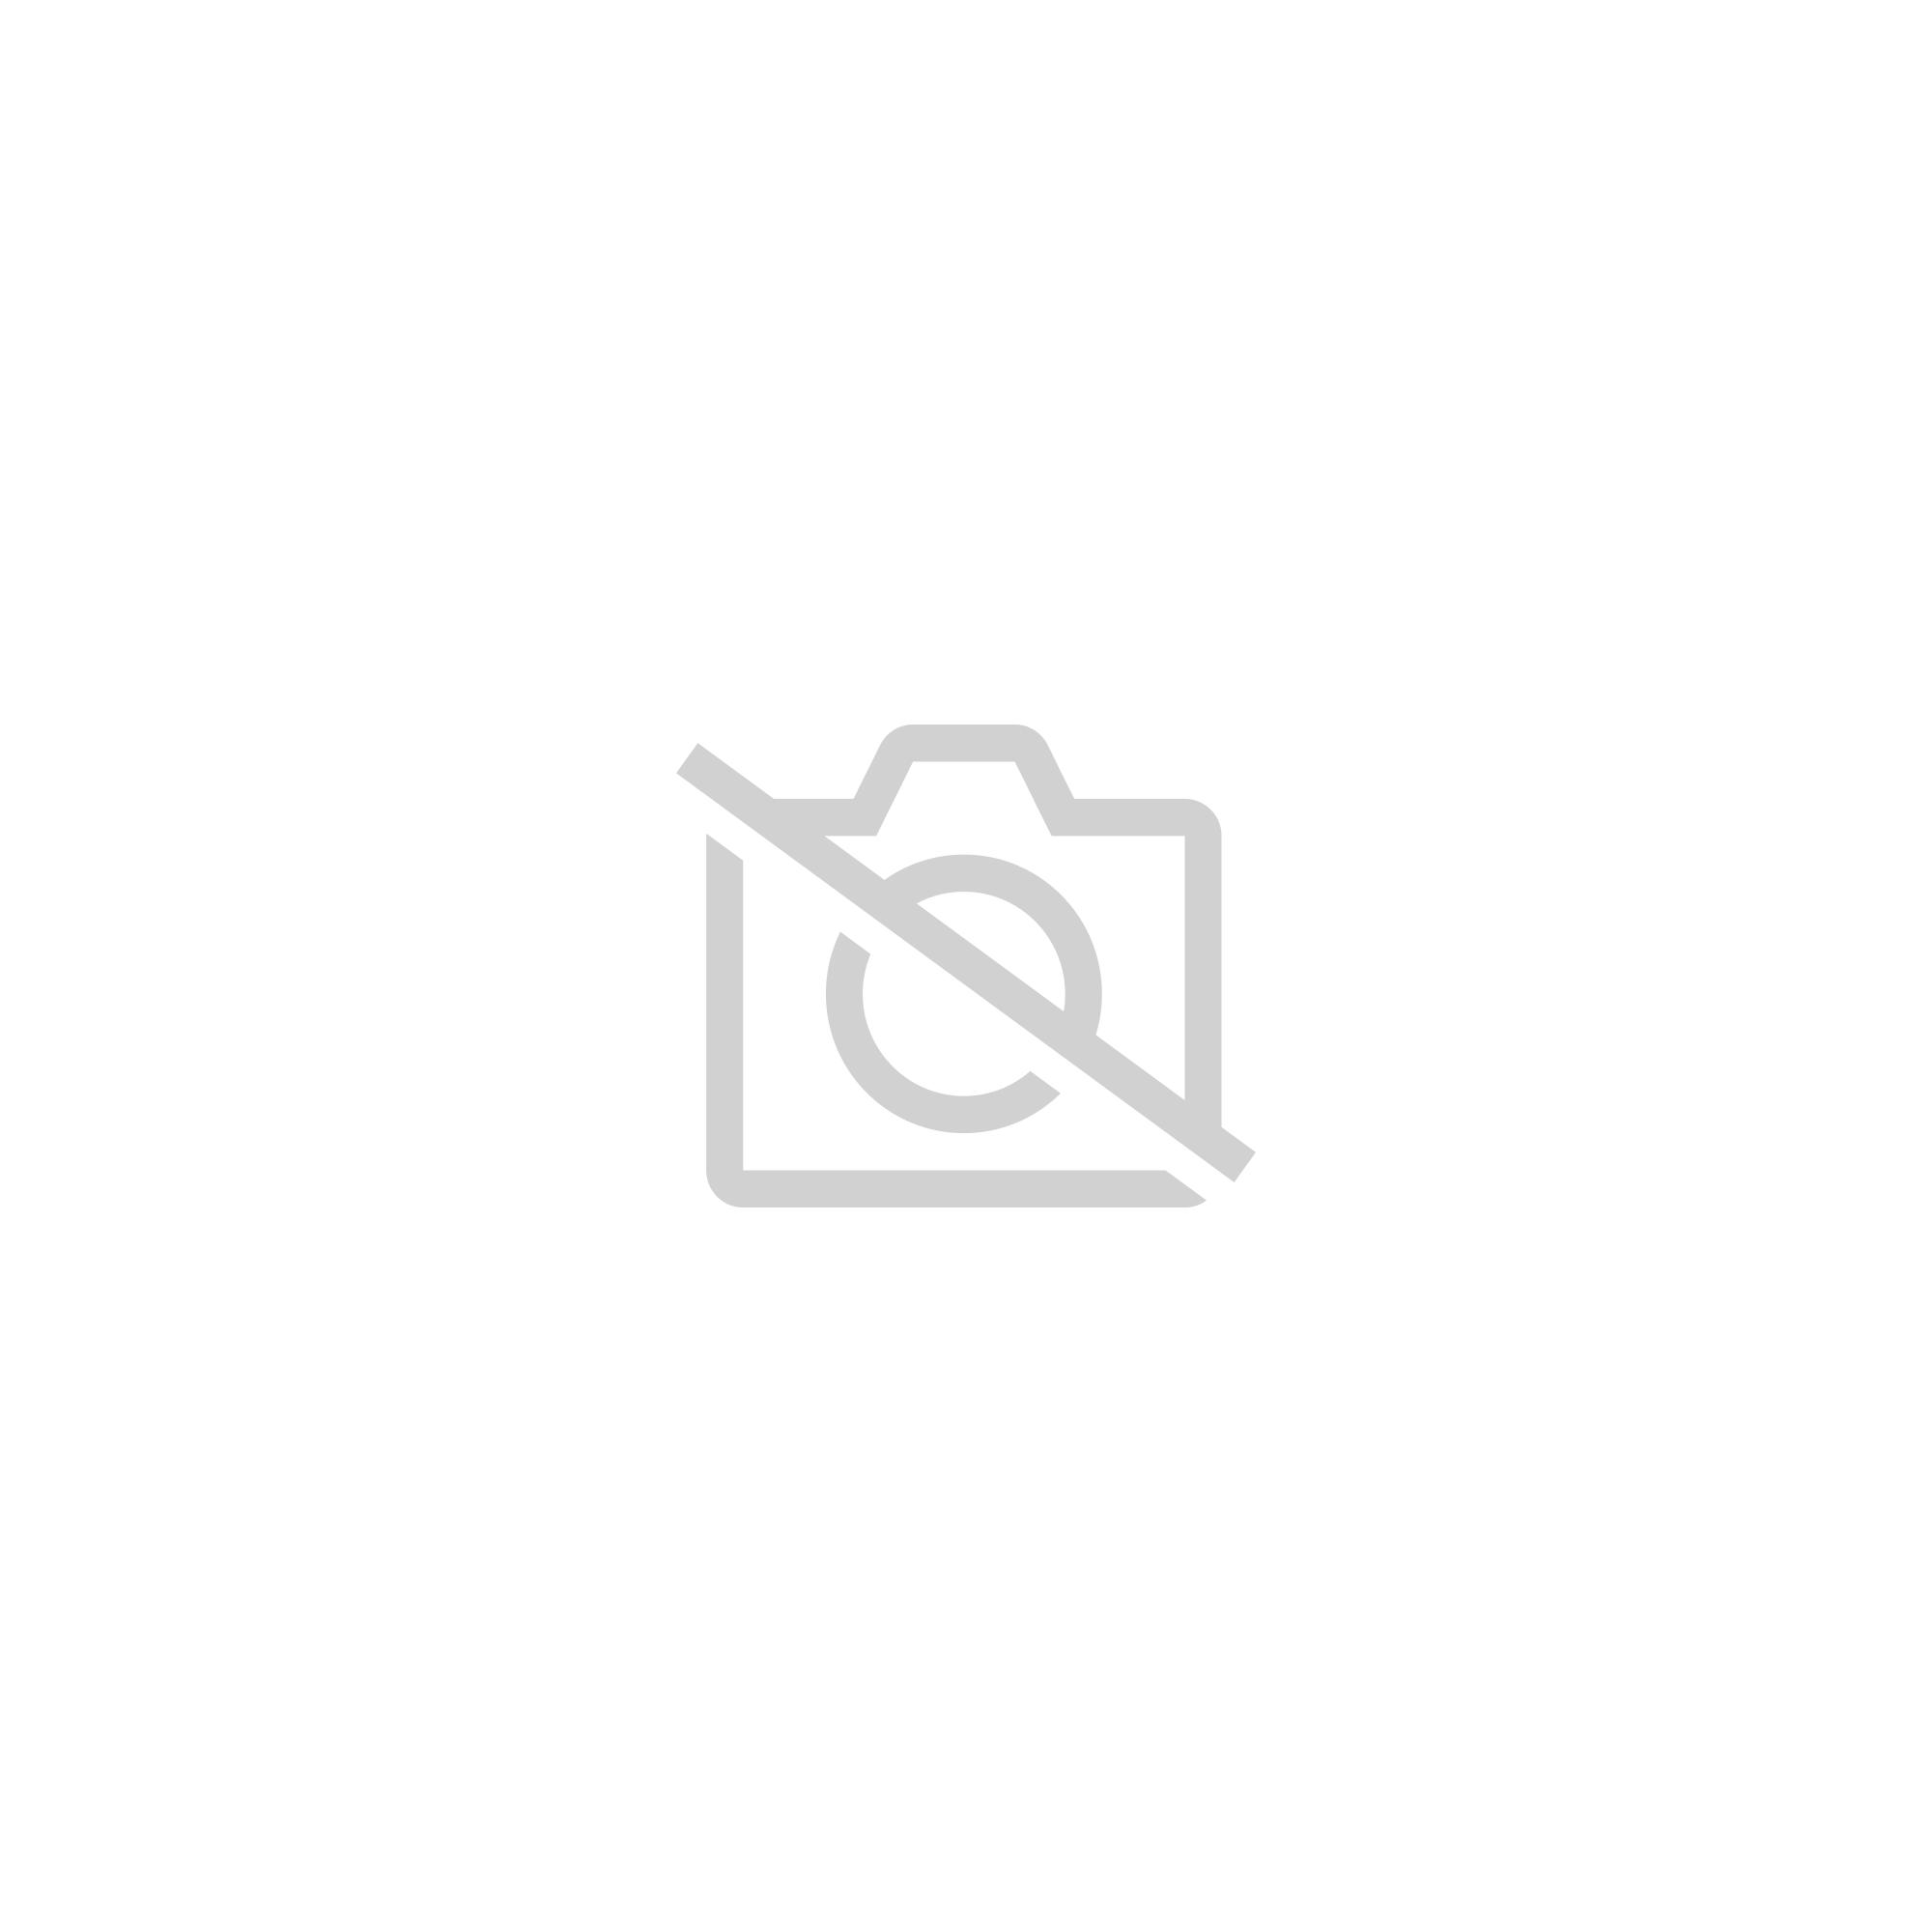 HP - Adaptateur secteur - 40 Watt - Europe